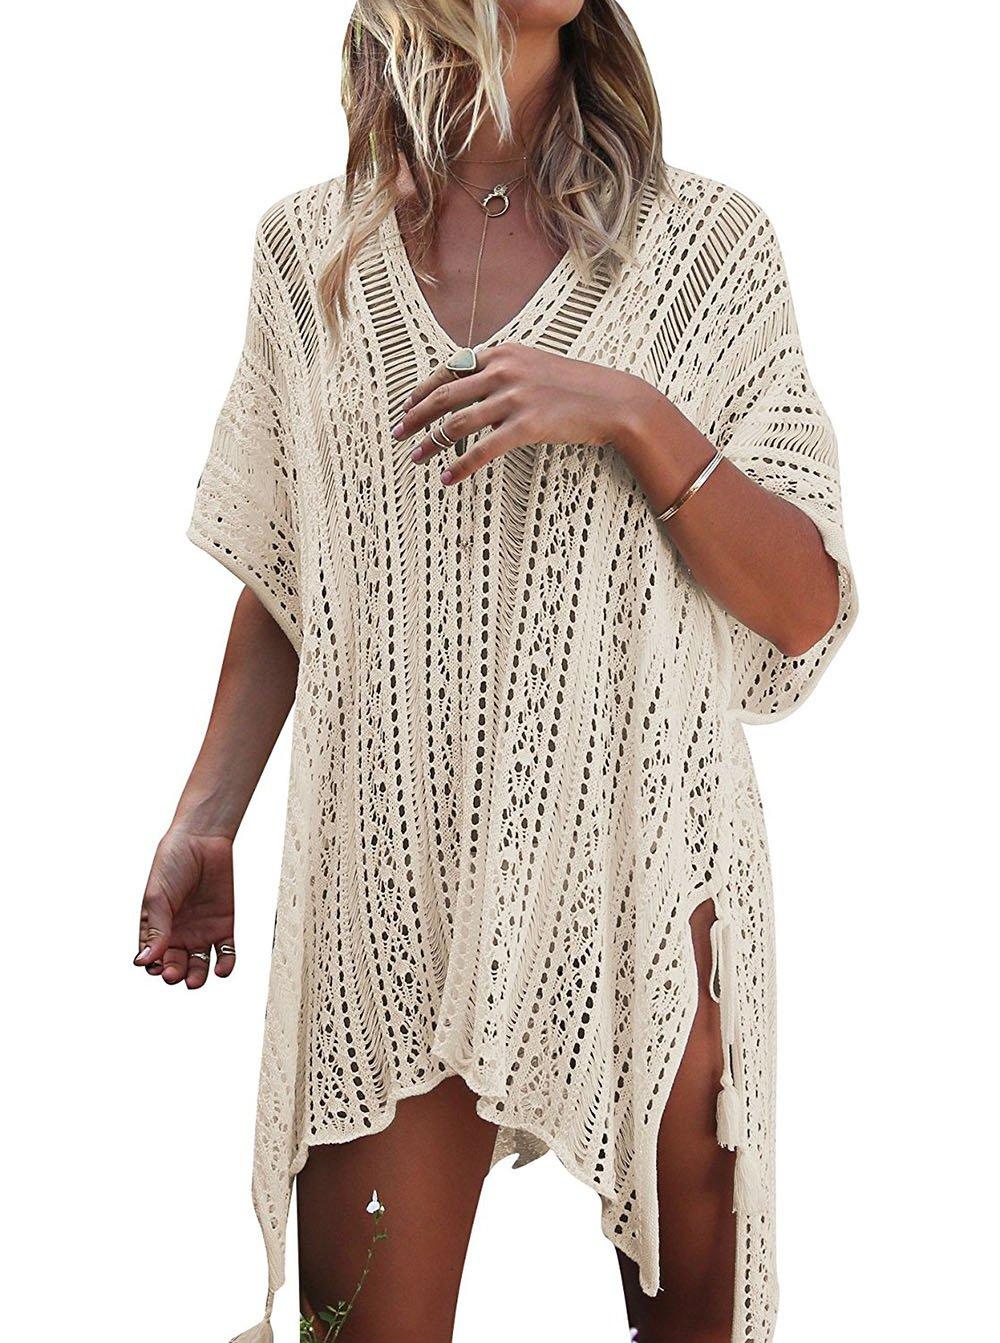 HARHAY Women's Summer Swimsuit Bikini Beach Swimwear Cover up Beige